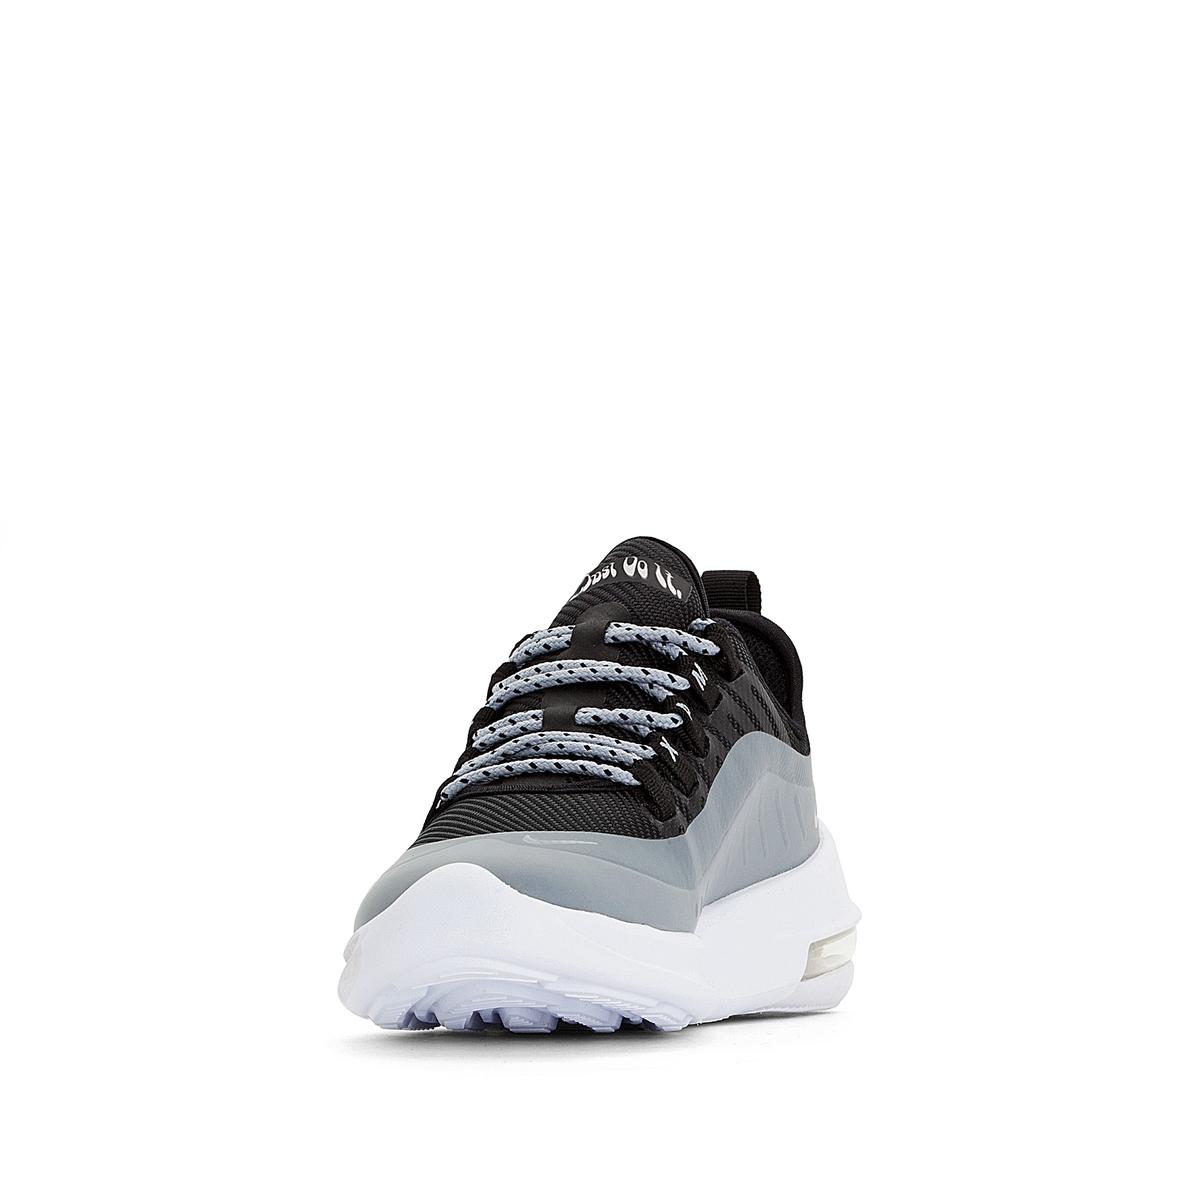 Imagen secundaria de producto de Zapatillas Air Max Axis - Nike